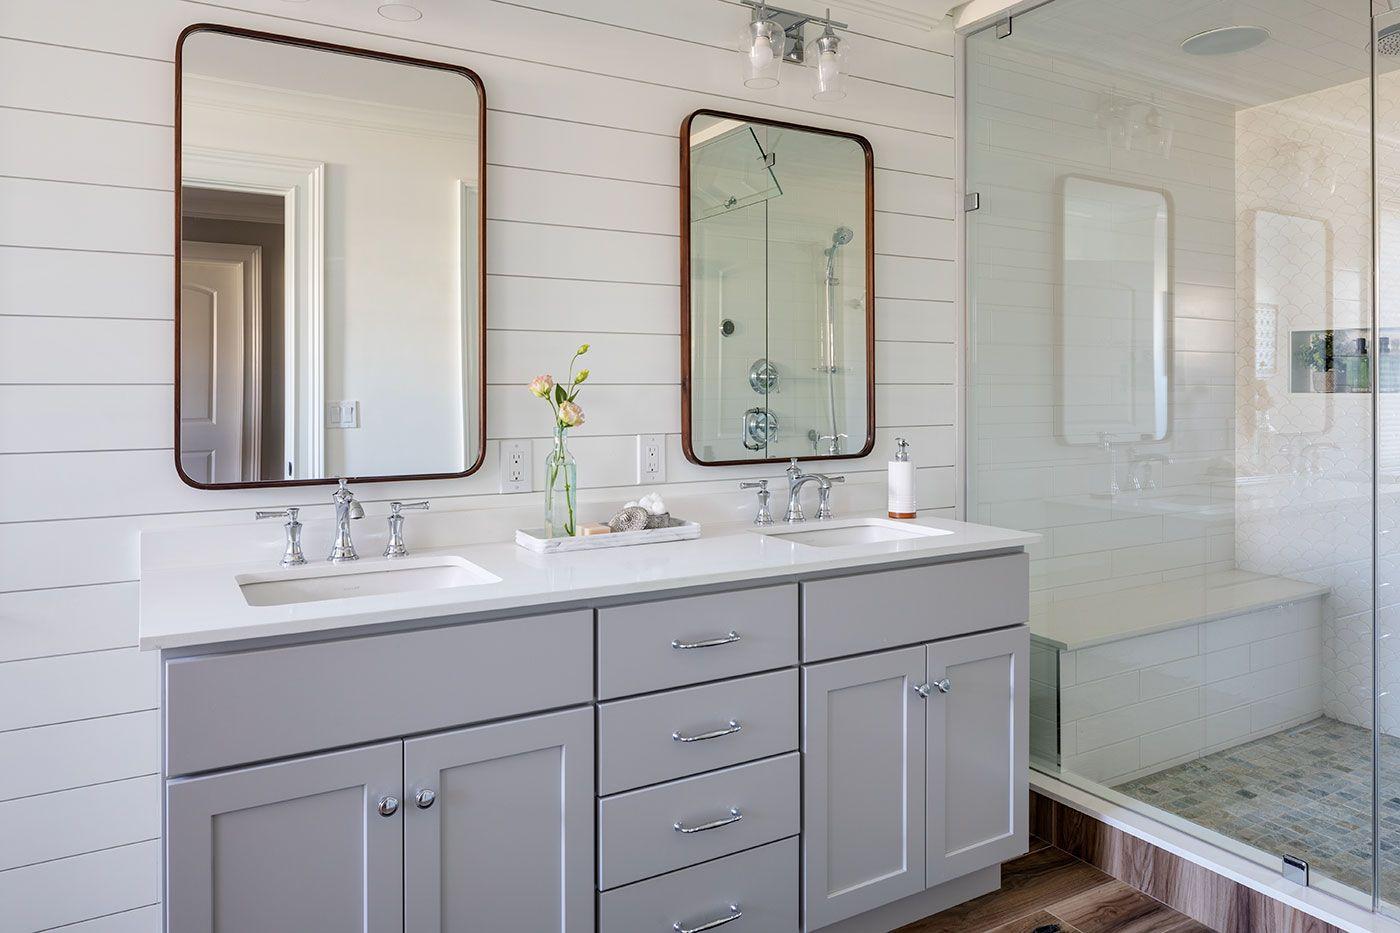 Built By Hawthorne Builders Photography By Greg Premru Boston Design Guide Prelude 2020 Spring Edition Bathrooms Remodel Transitional House Kids Bathroom [ jpg ]